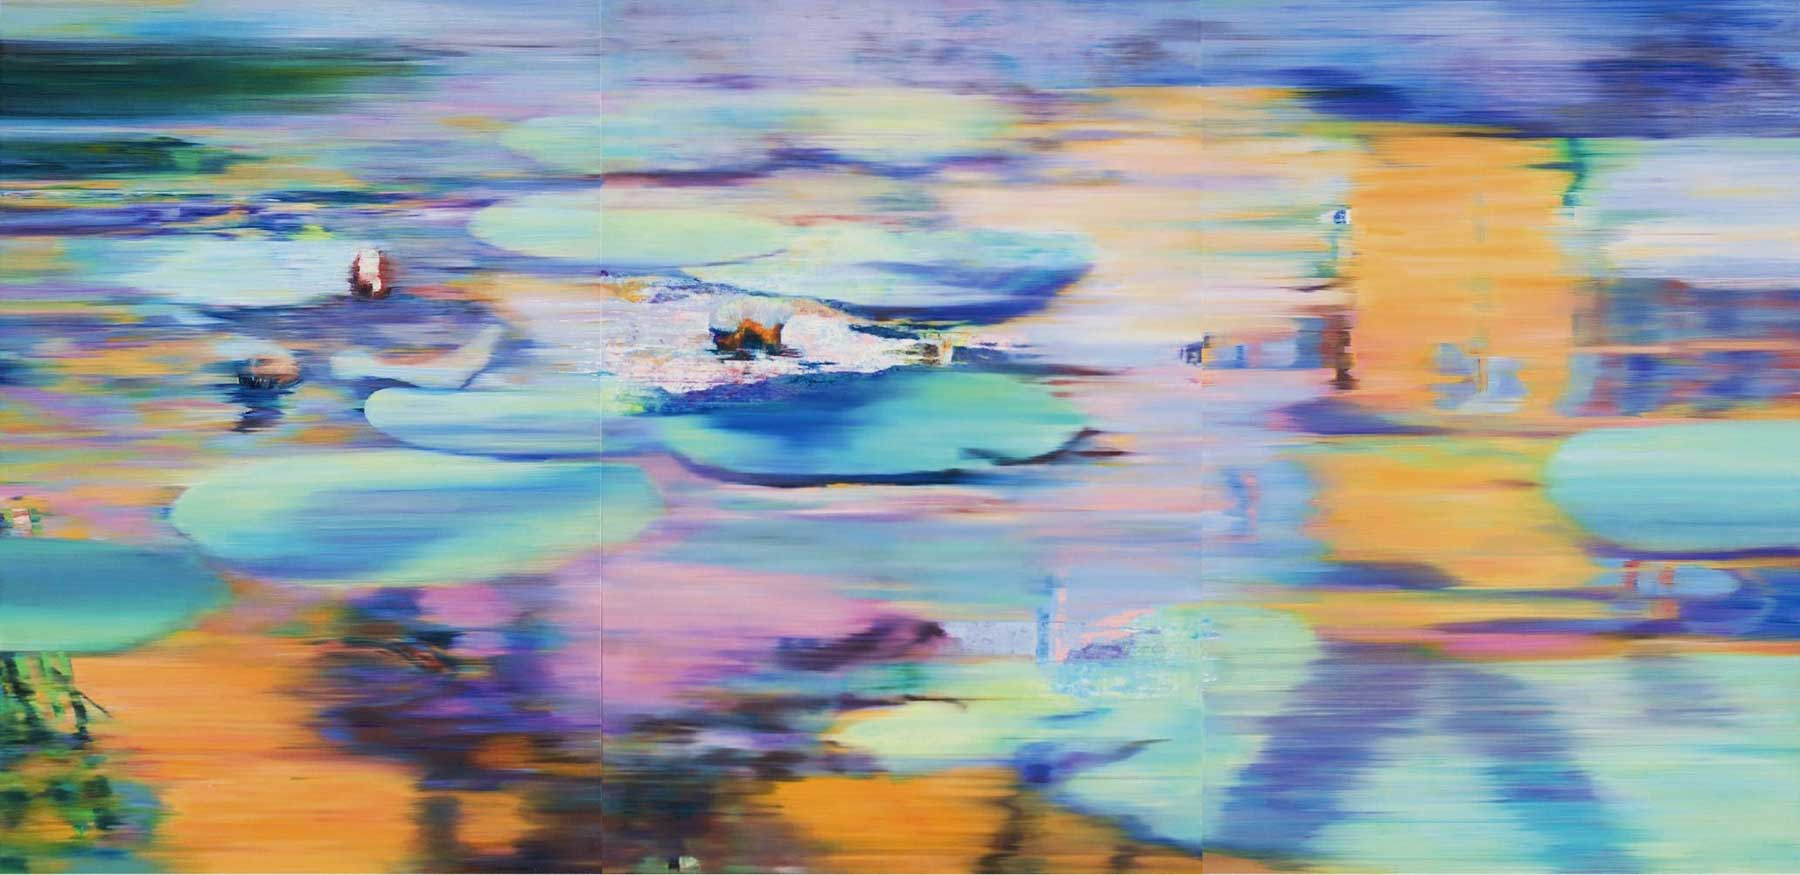 cristina-cocco-artista-euryale-ferox-252x522-olio-2008